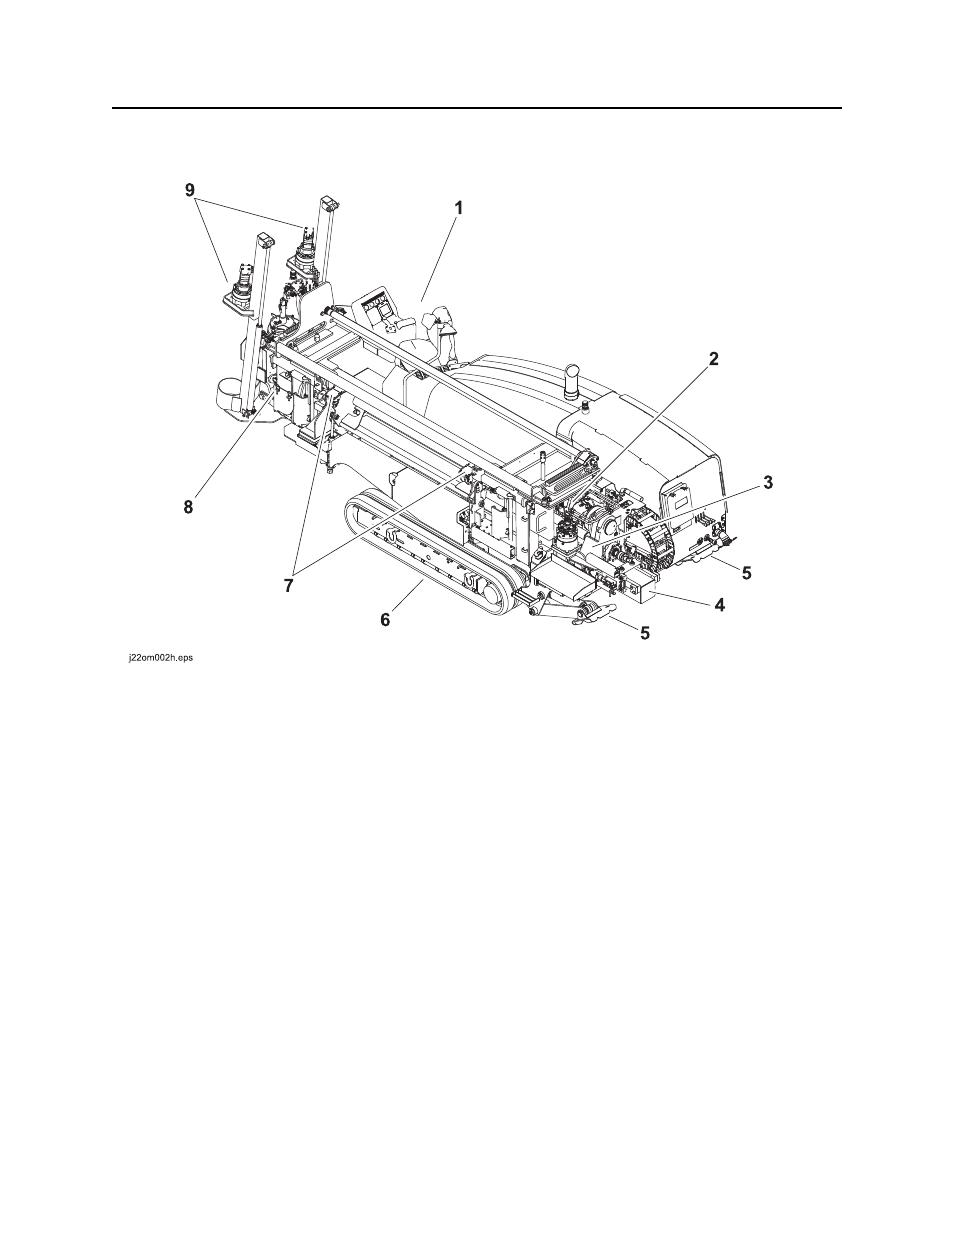 Unit components, Jt30 /jt30 all terrain operator's manual